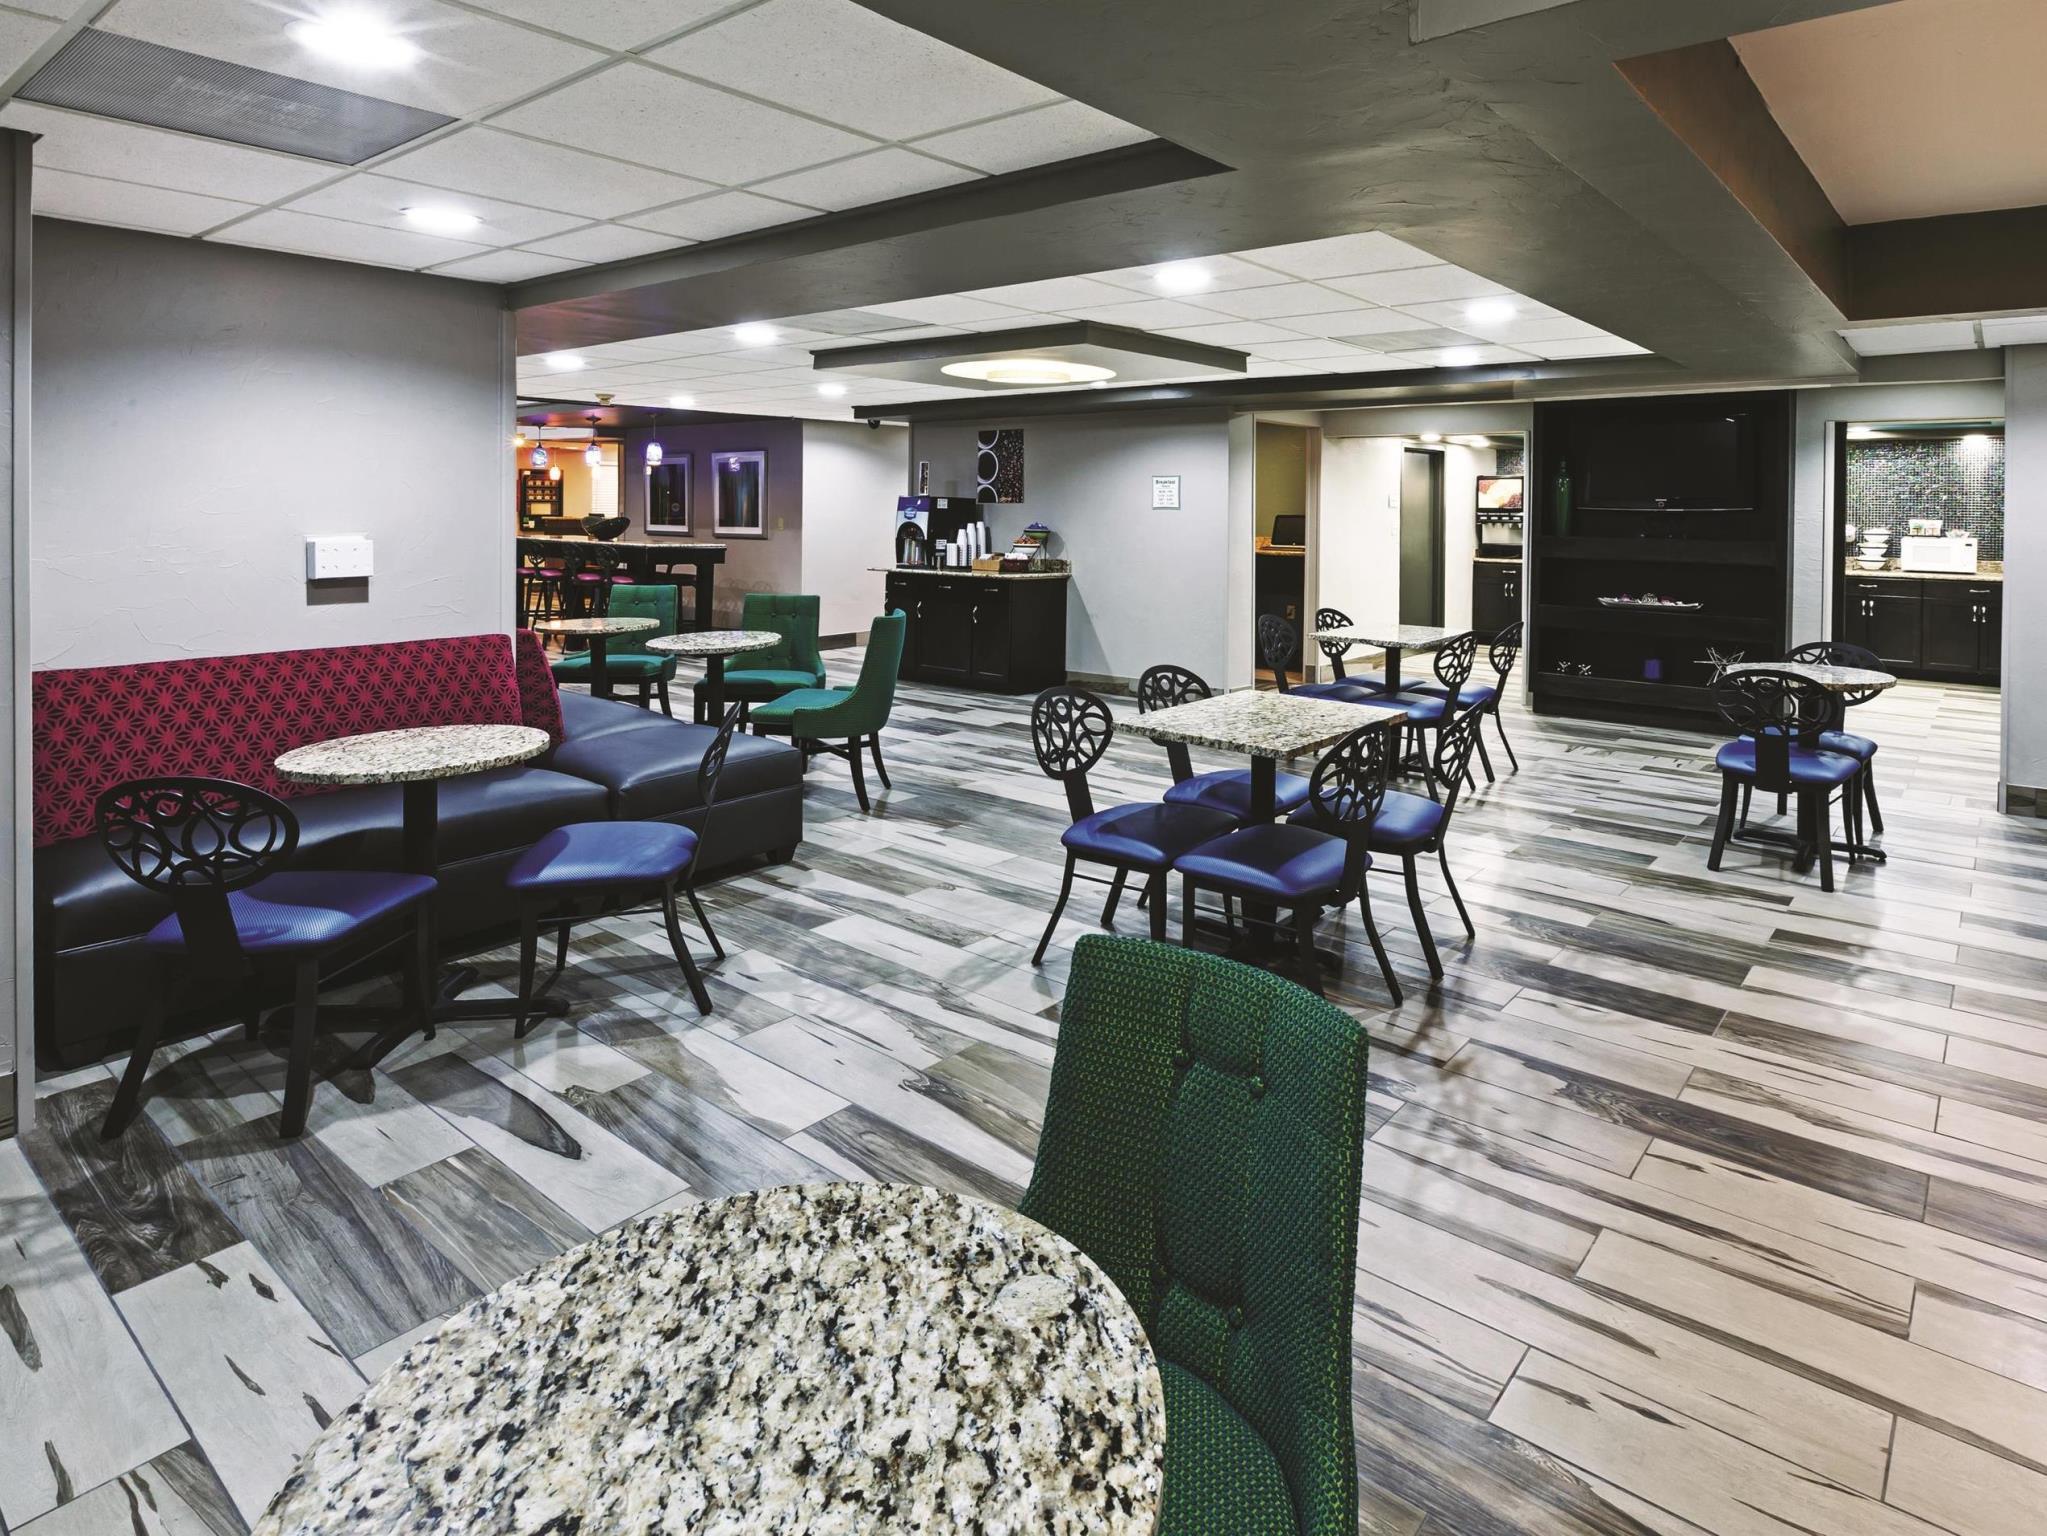 La Quinta Inn & Suites By Wyndham Denison   N. Lake Texoma